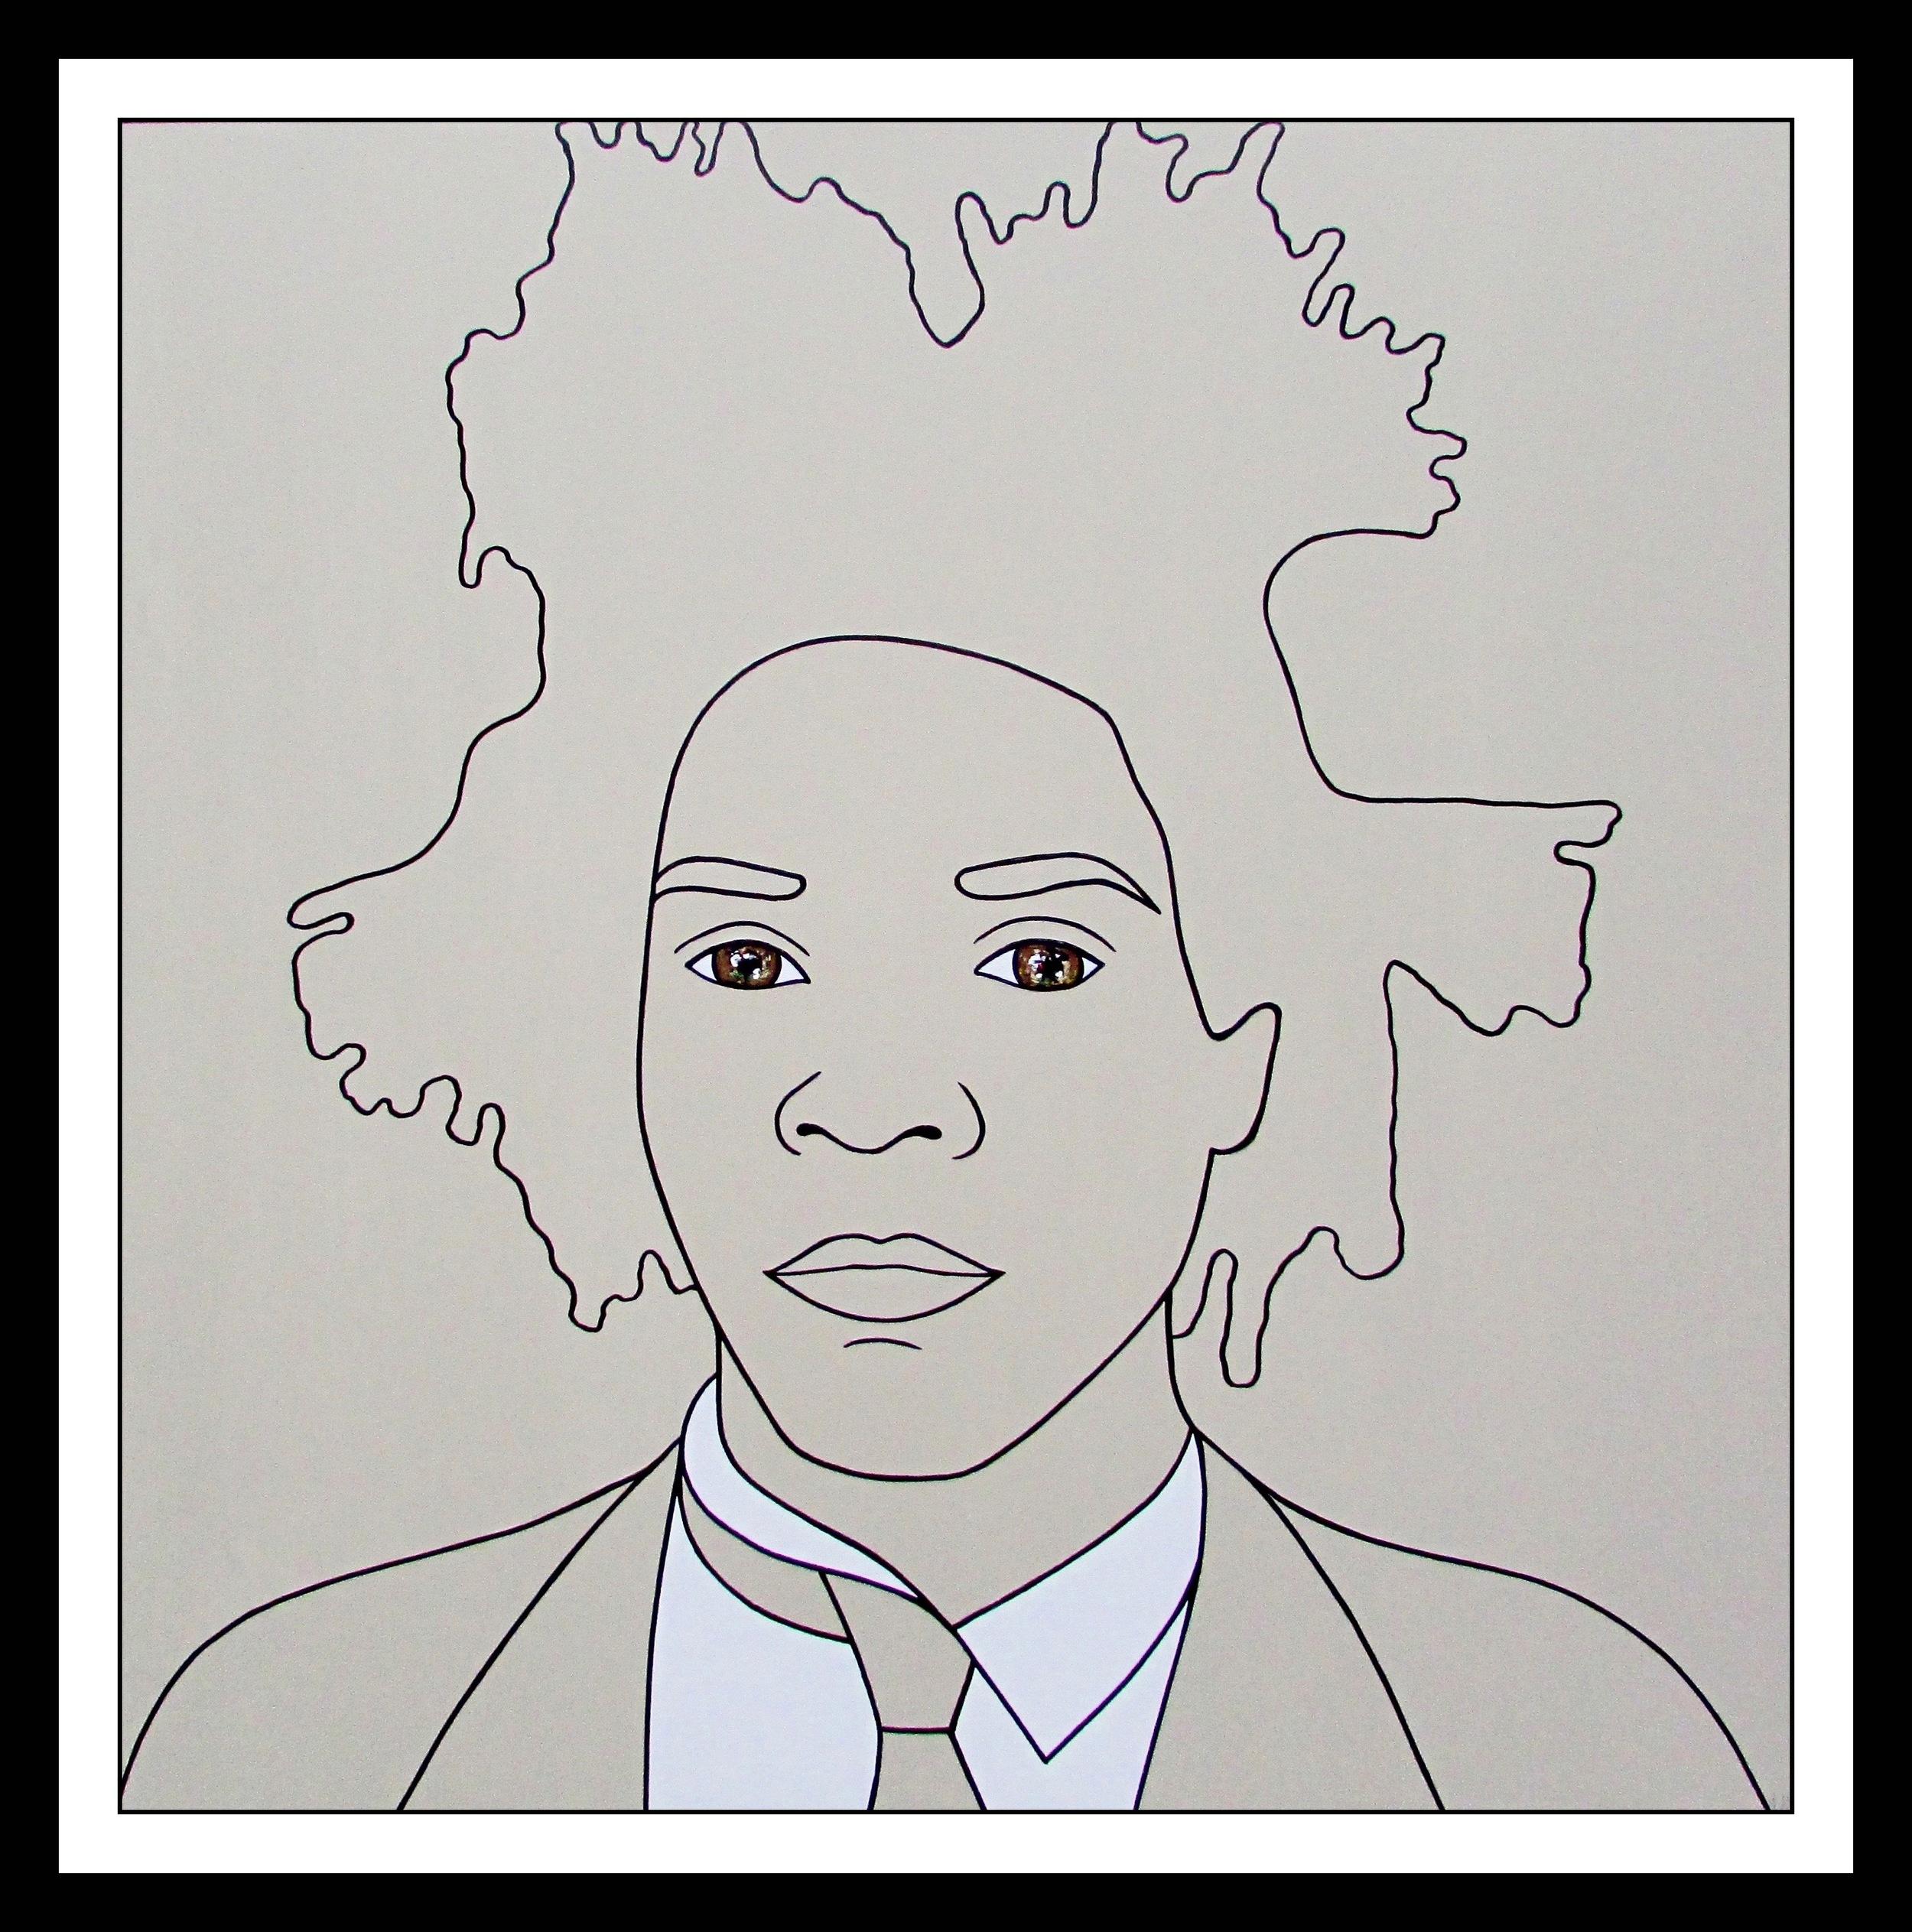 Heroes- zBasquiat, 48 x 48 inches, Brand Us Art1 (1).jpg